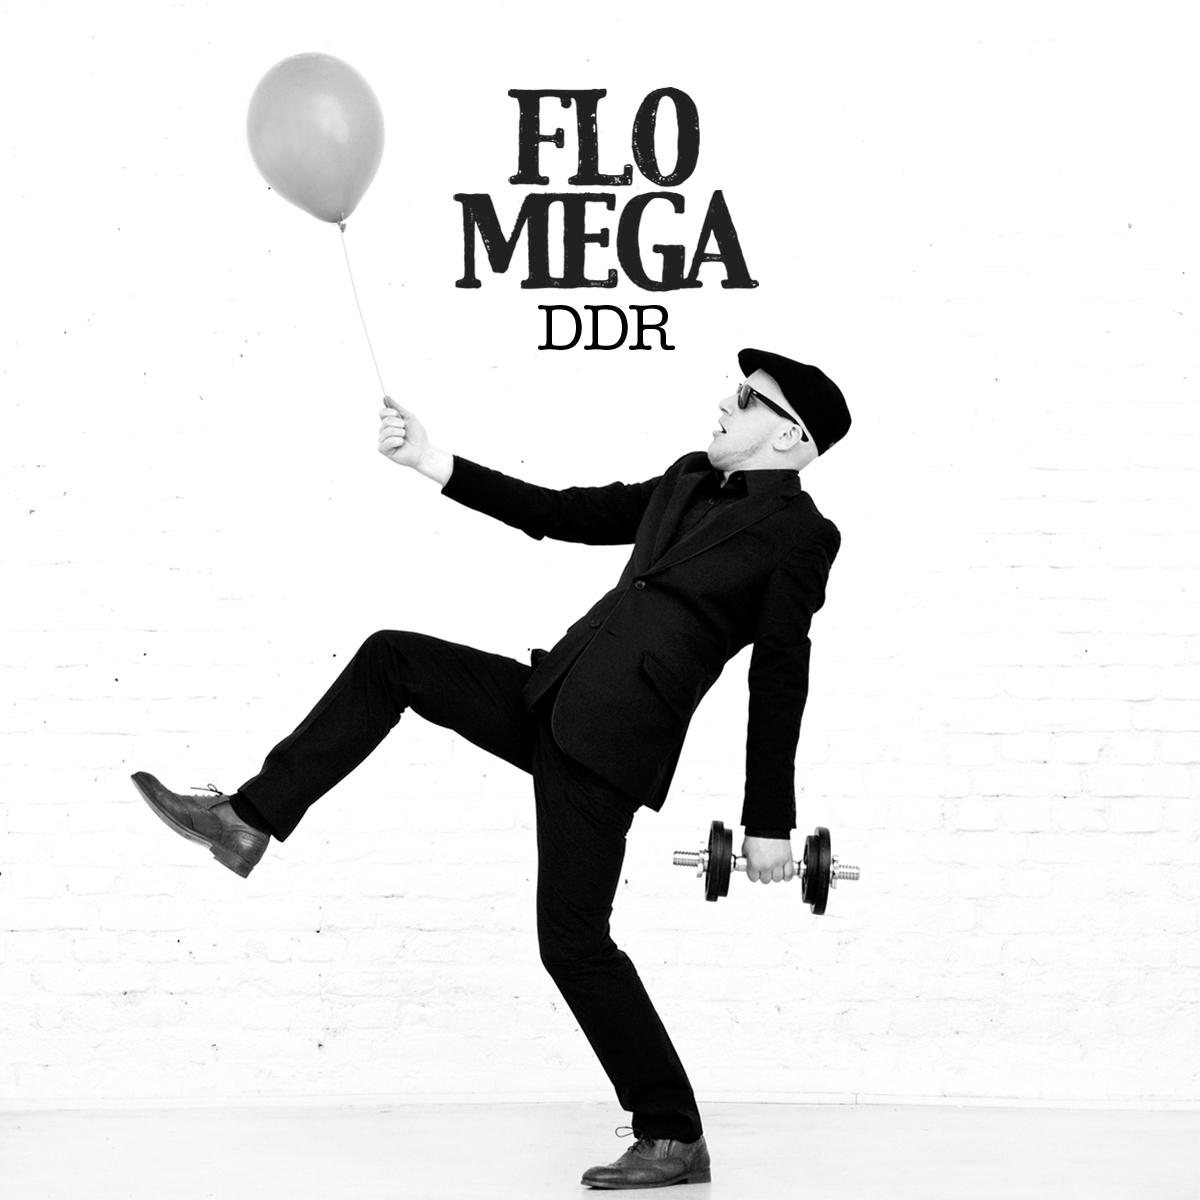 flo mega - ddr bw